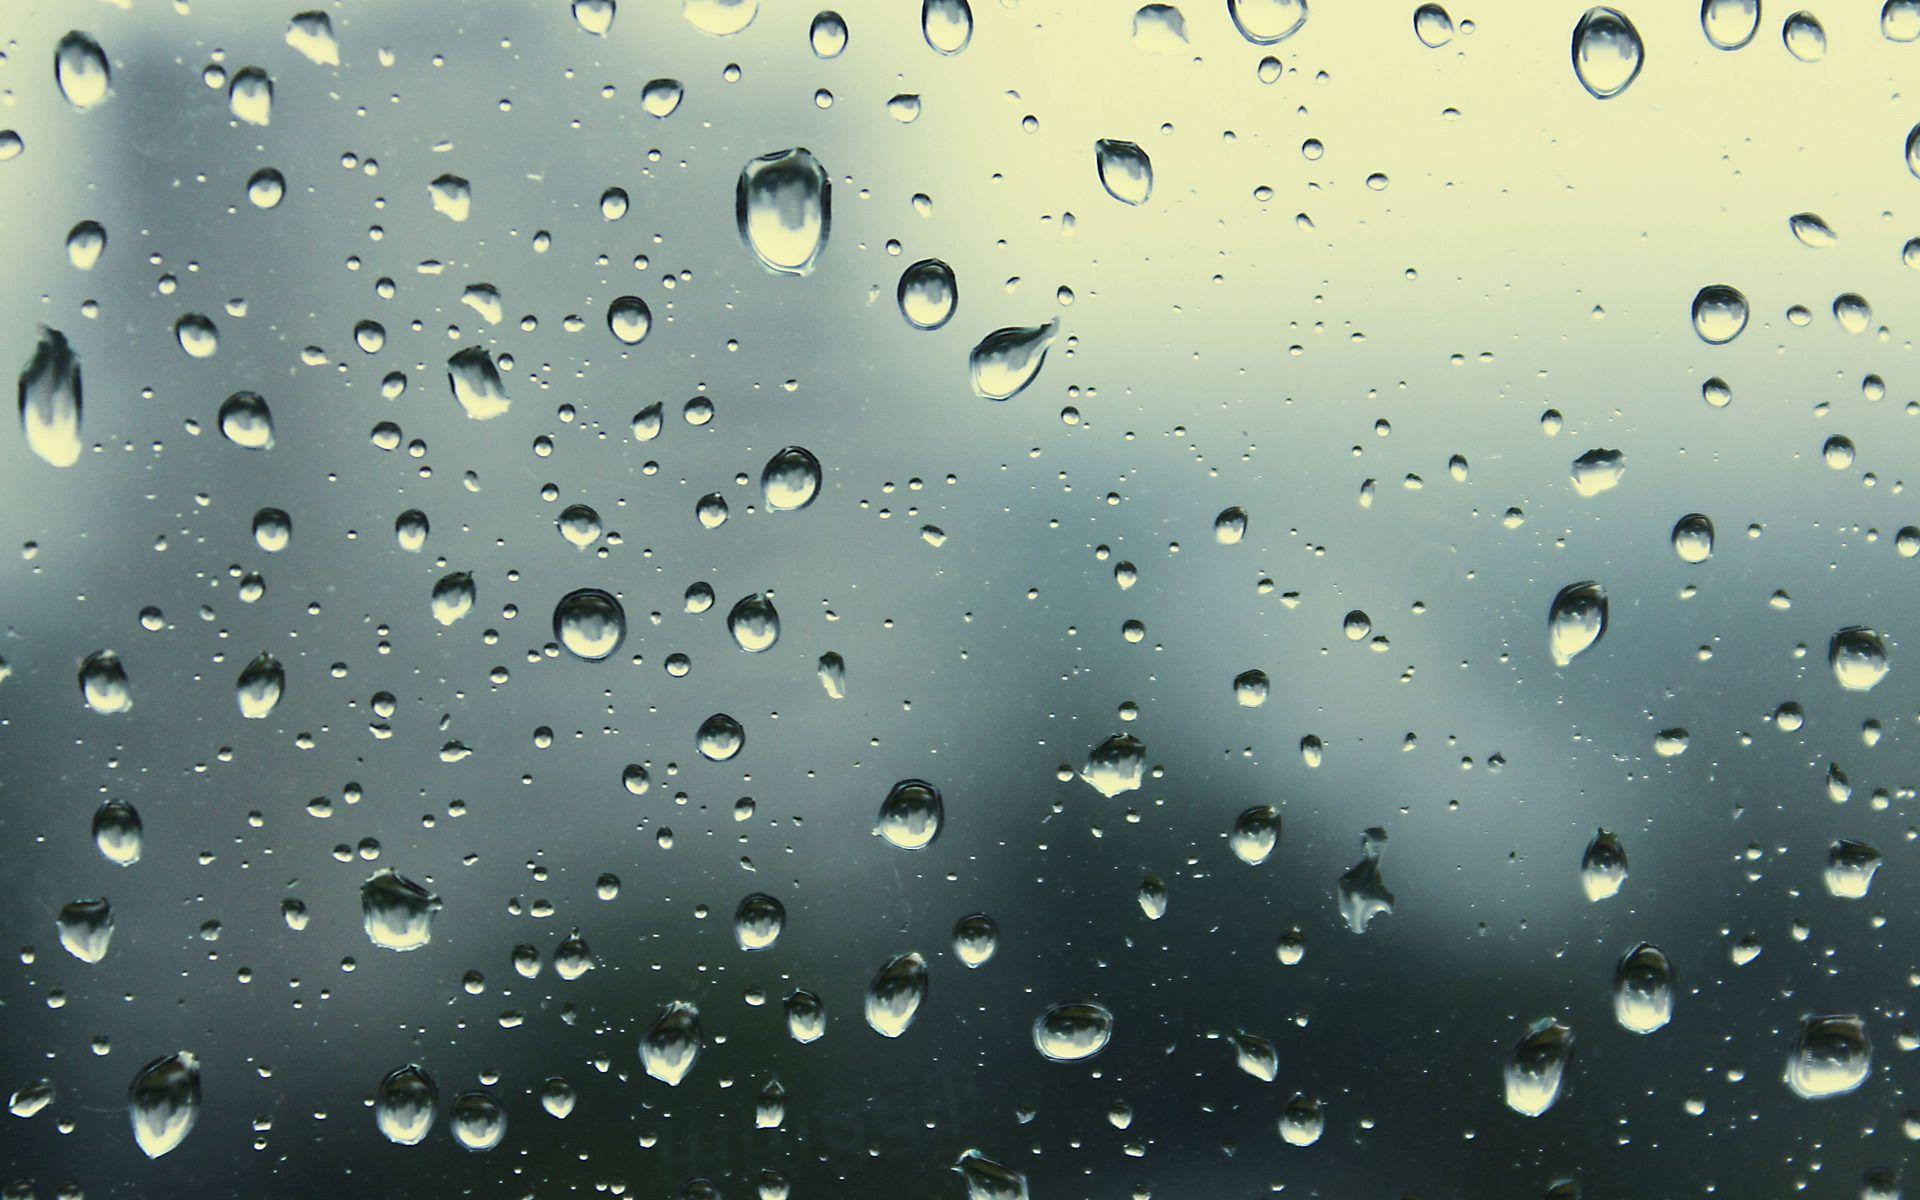 Rain Drops On Glass Wallpaper Rain Drops Computer Wallpaper Rain